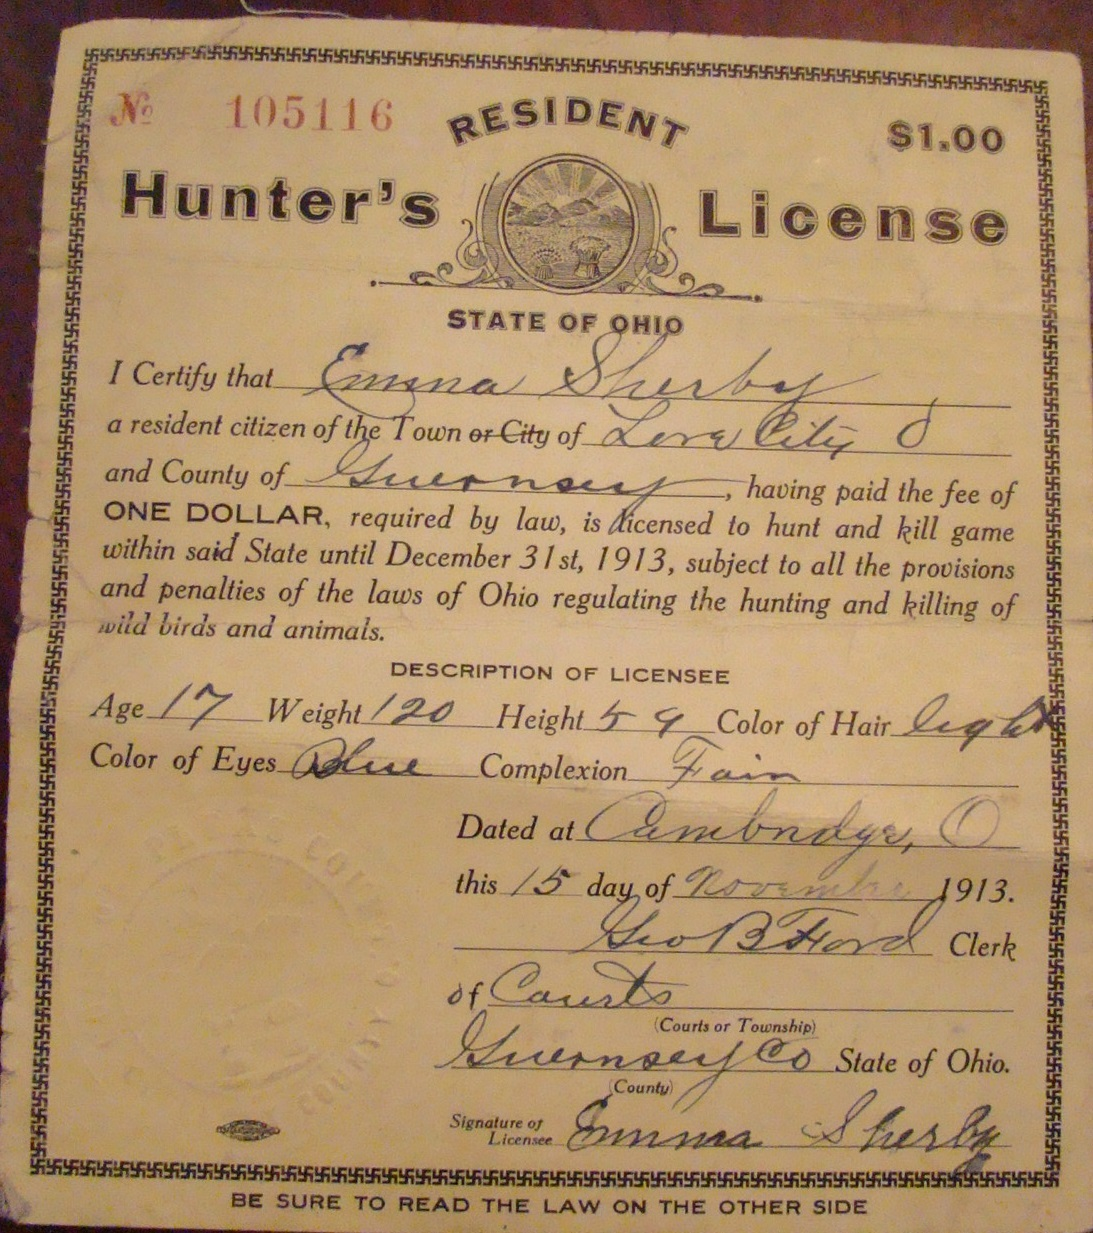 Emma's Hunting License